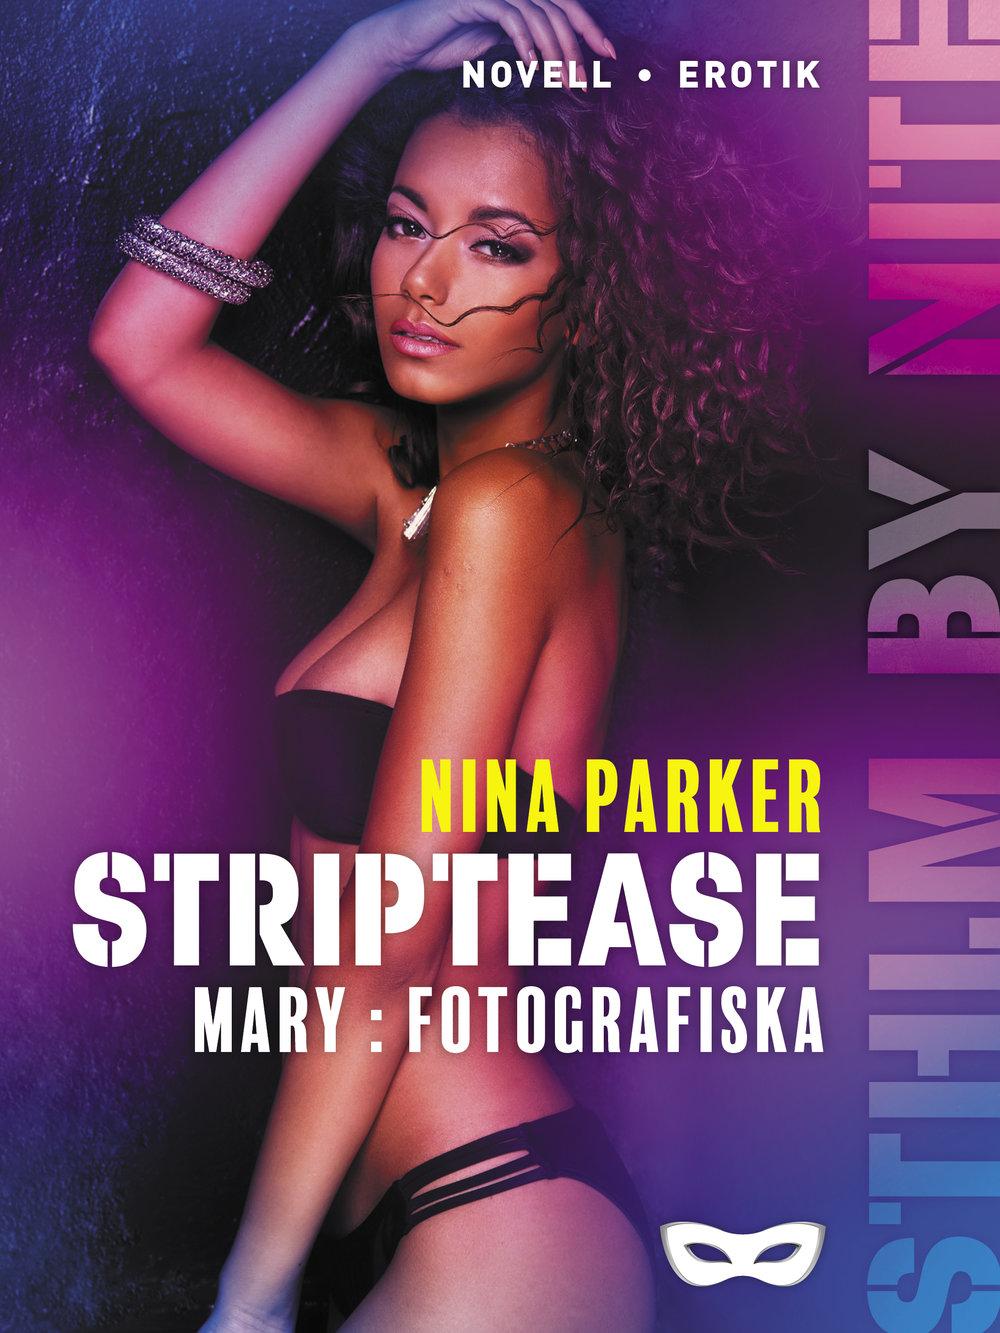 NPS2E2_Striptease_Nina Parker.jpg